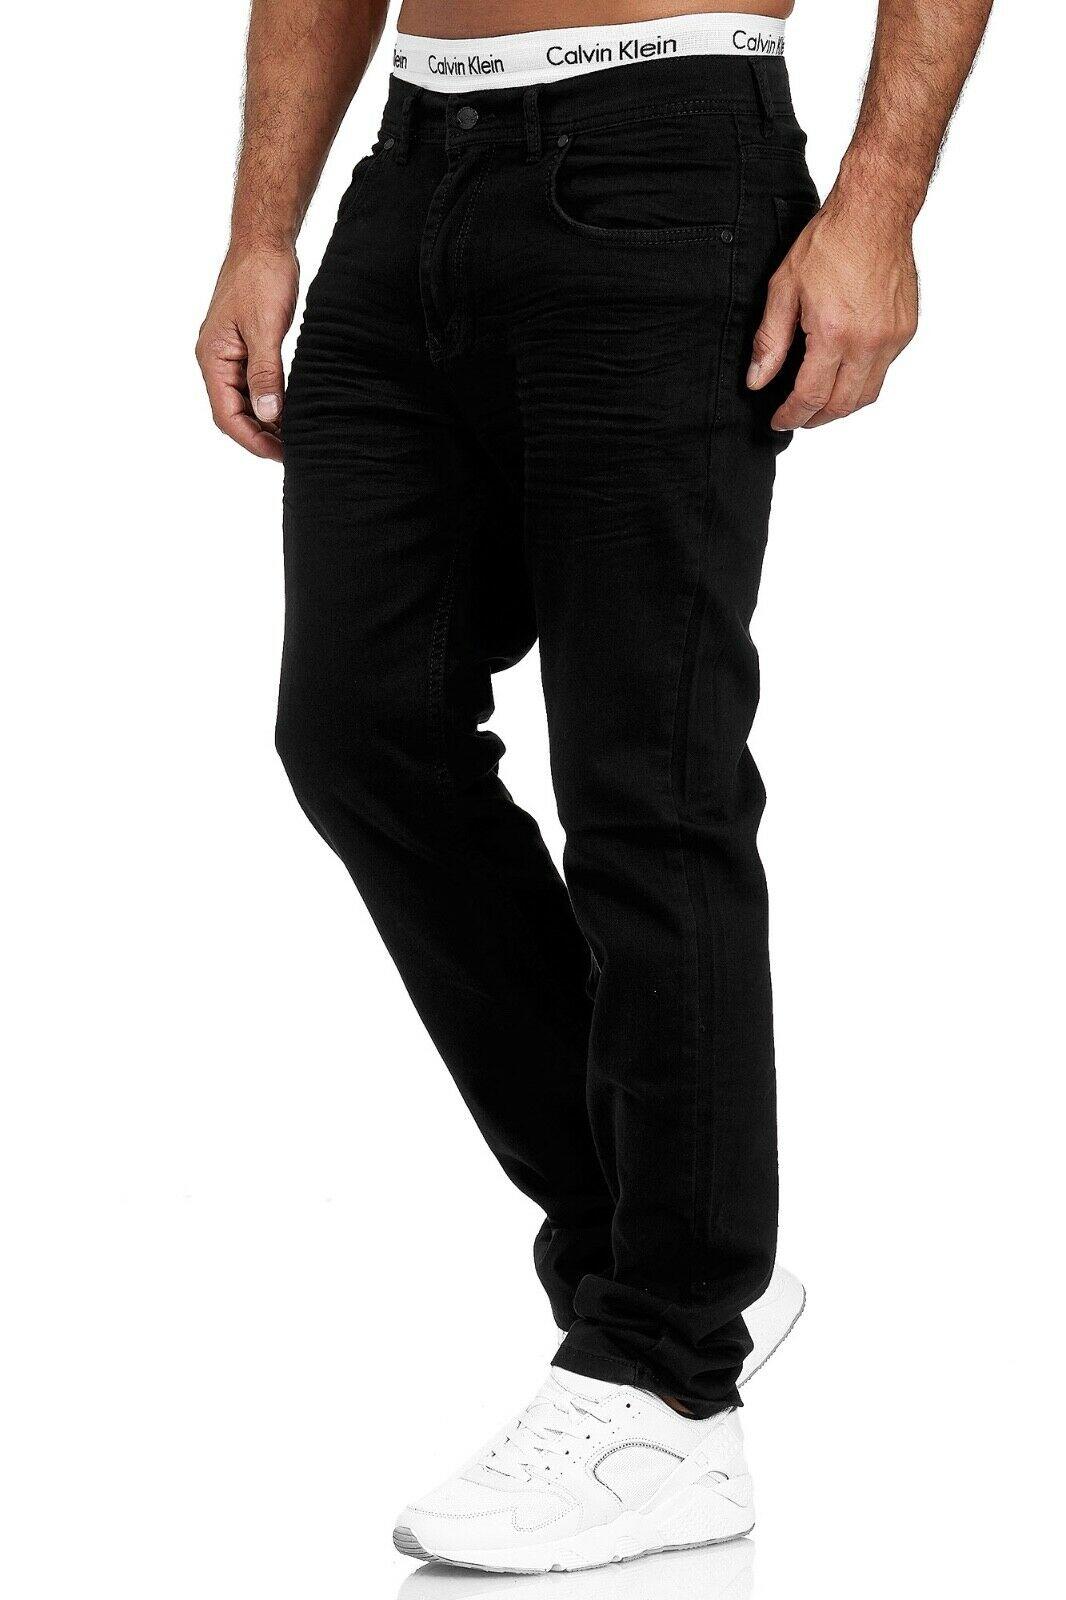 Herren-Jeans-Hose-Denim-KC-Black-Washed-Straight-Cut-Regular-Dicke-Naht-naehte Indexbild 77